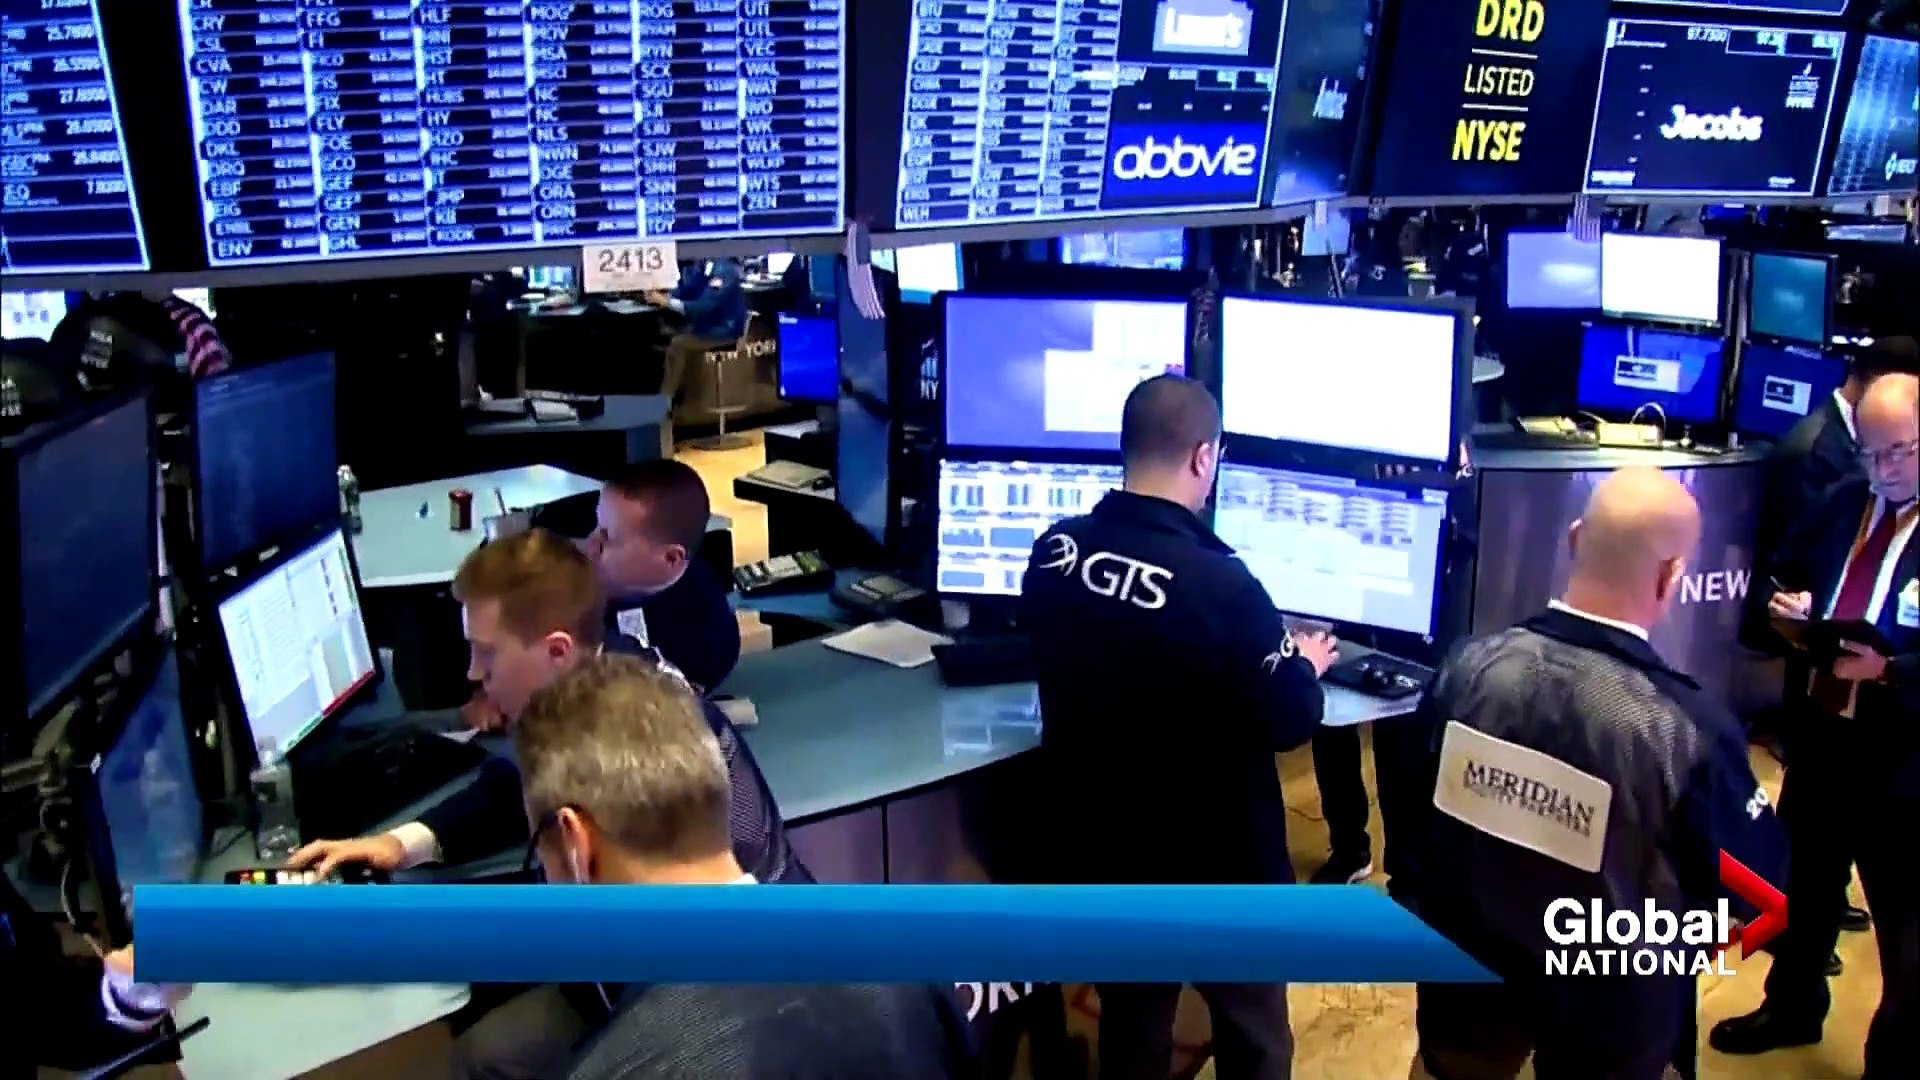 CORONAVIRUS OUTBREAK. U.S. HAS RAISED THREAT TO HIGHEST LEVEL. TODAY'S NEWS